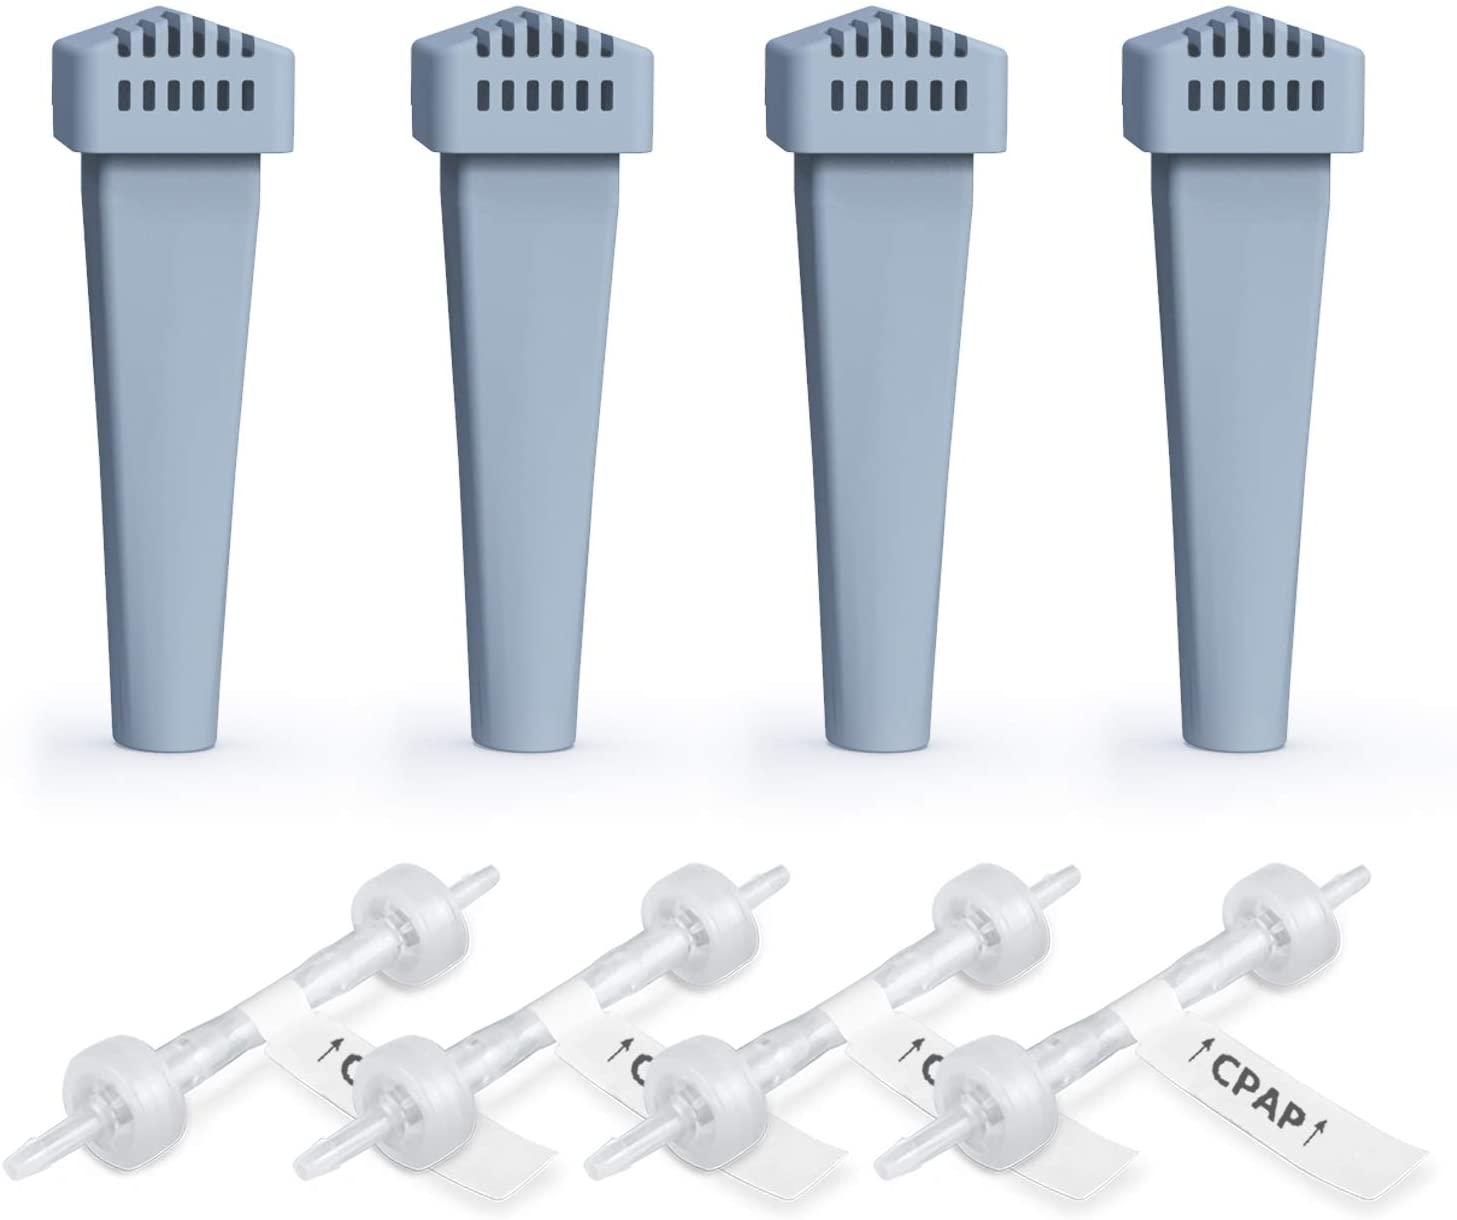 4Packs Filter Replacement Kit,Cartridge Filter Kit,Cartridge Filter Parts for Machine Accessory,Included 4 Cartridge Filters+4 Check Valve